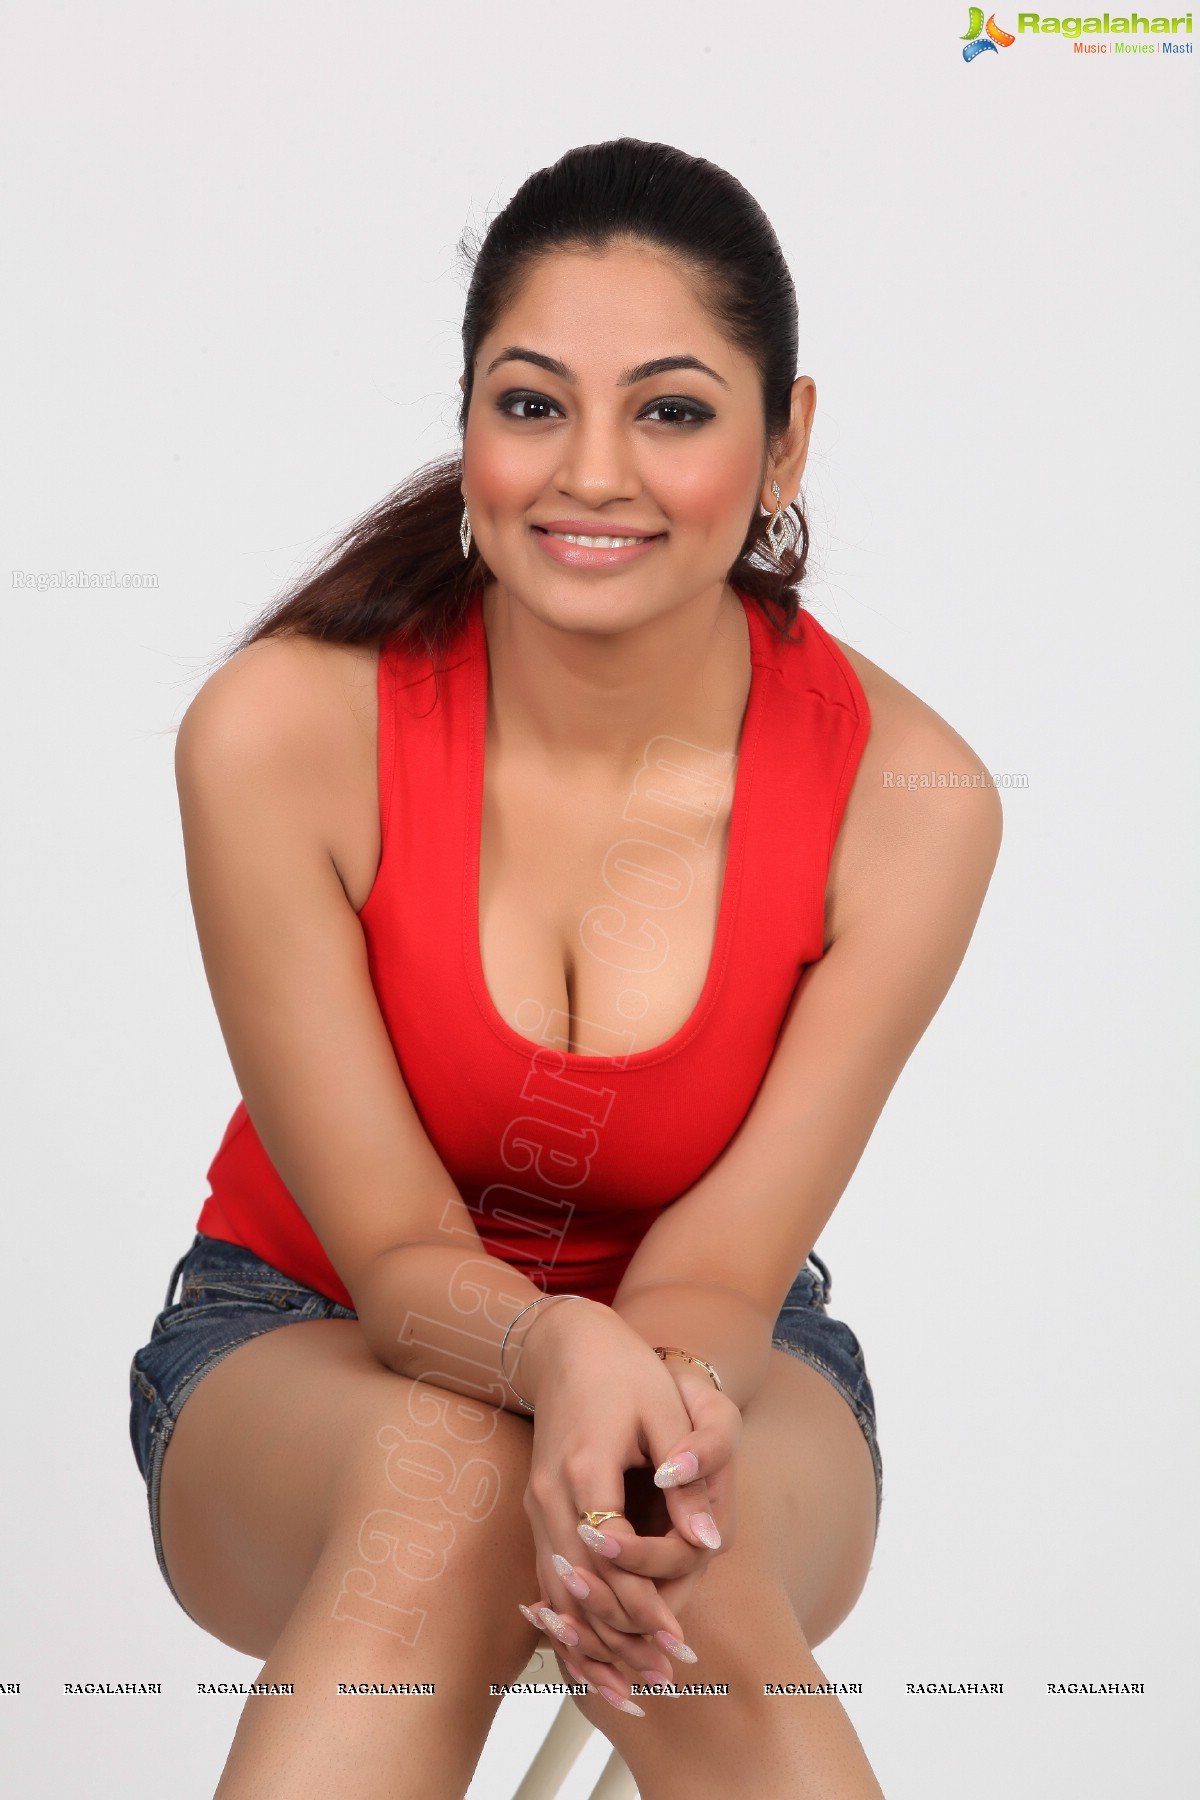 Mary Jo Pehl,Samaira Rao 2012?resent Erotic fotos Bette Midler,Selina Cadell